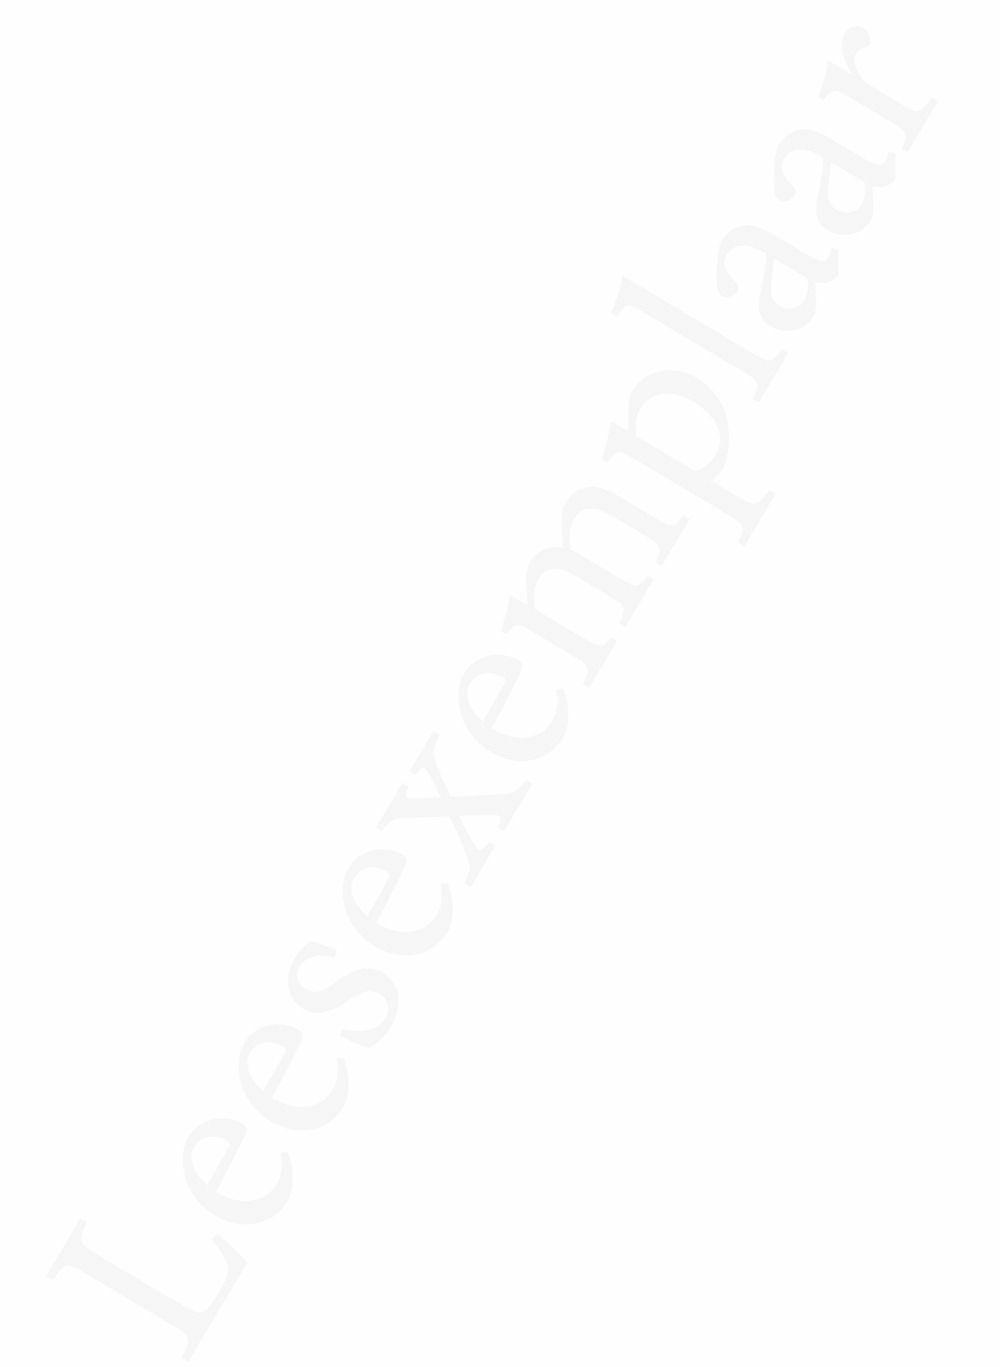 Preview: Drakeneiland (M5)